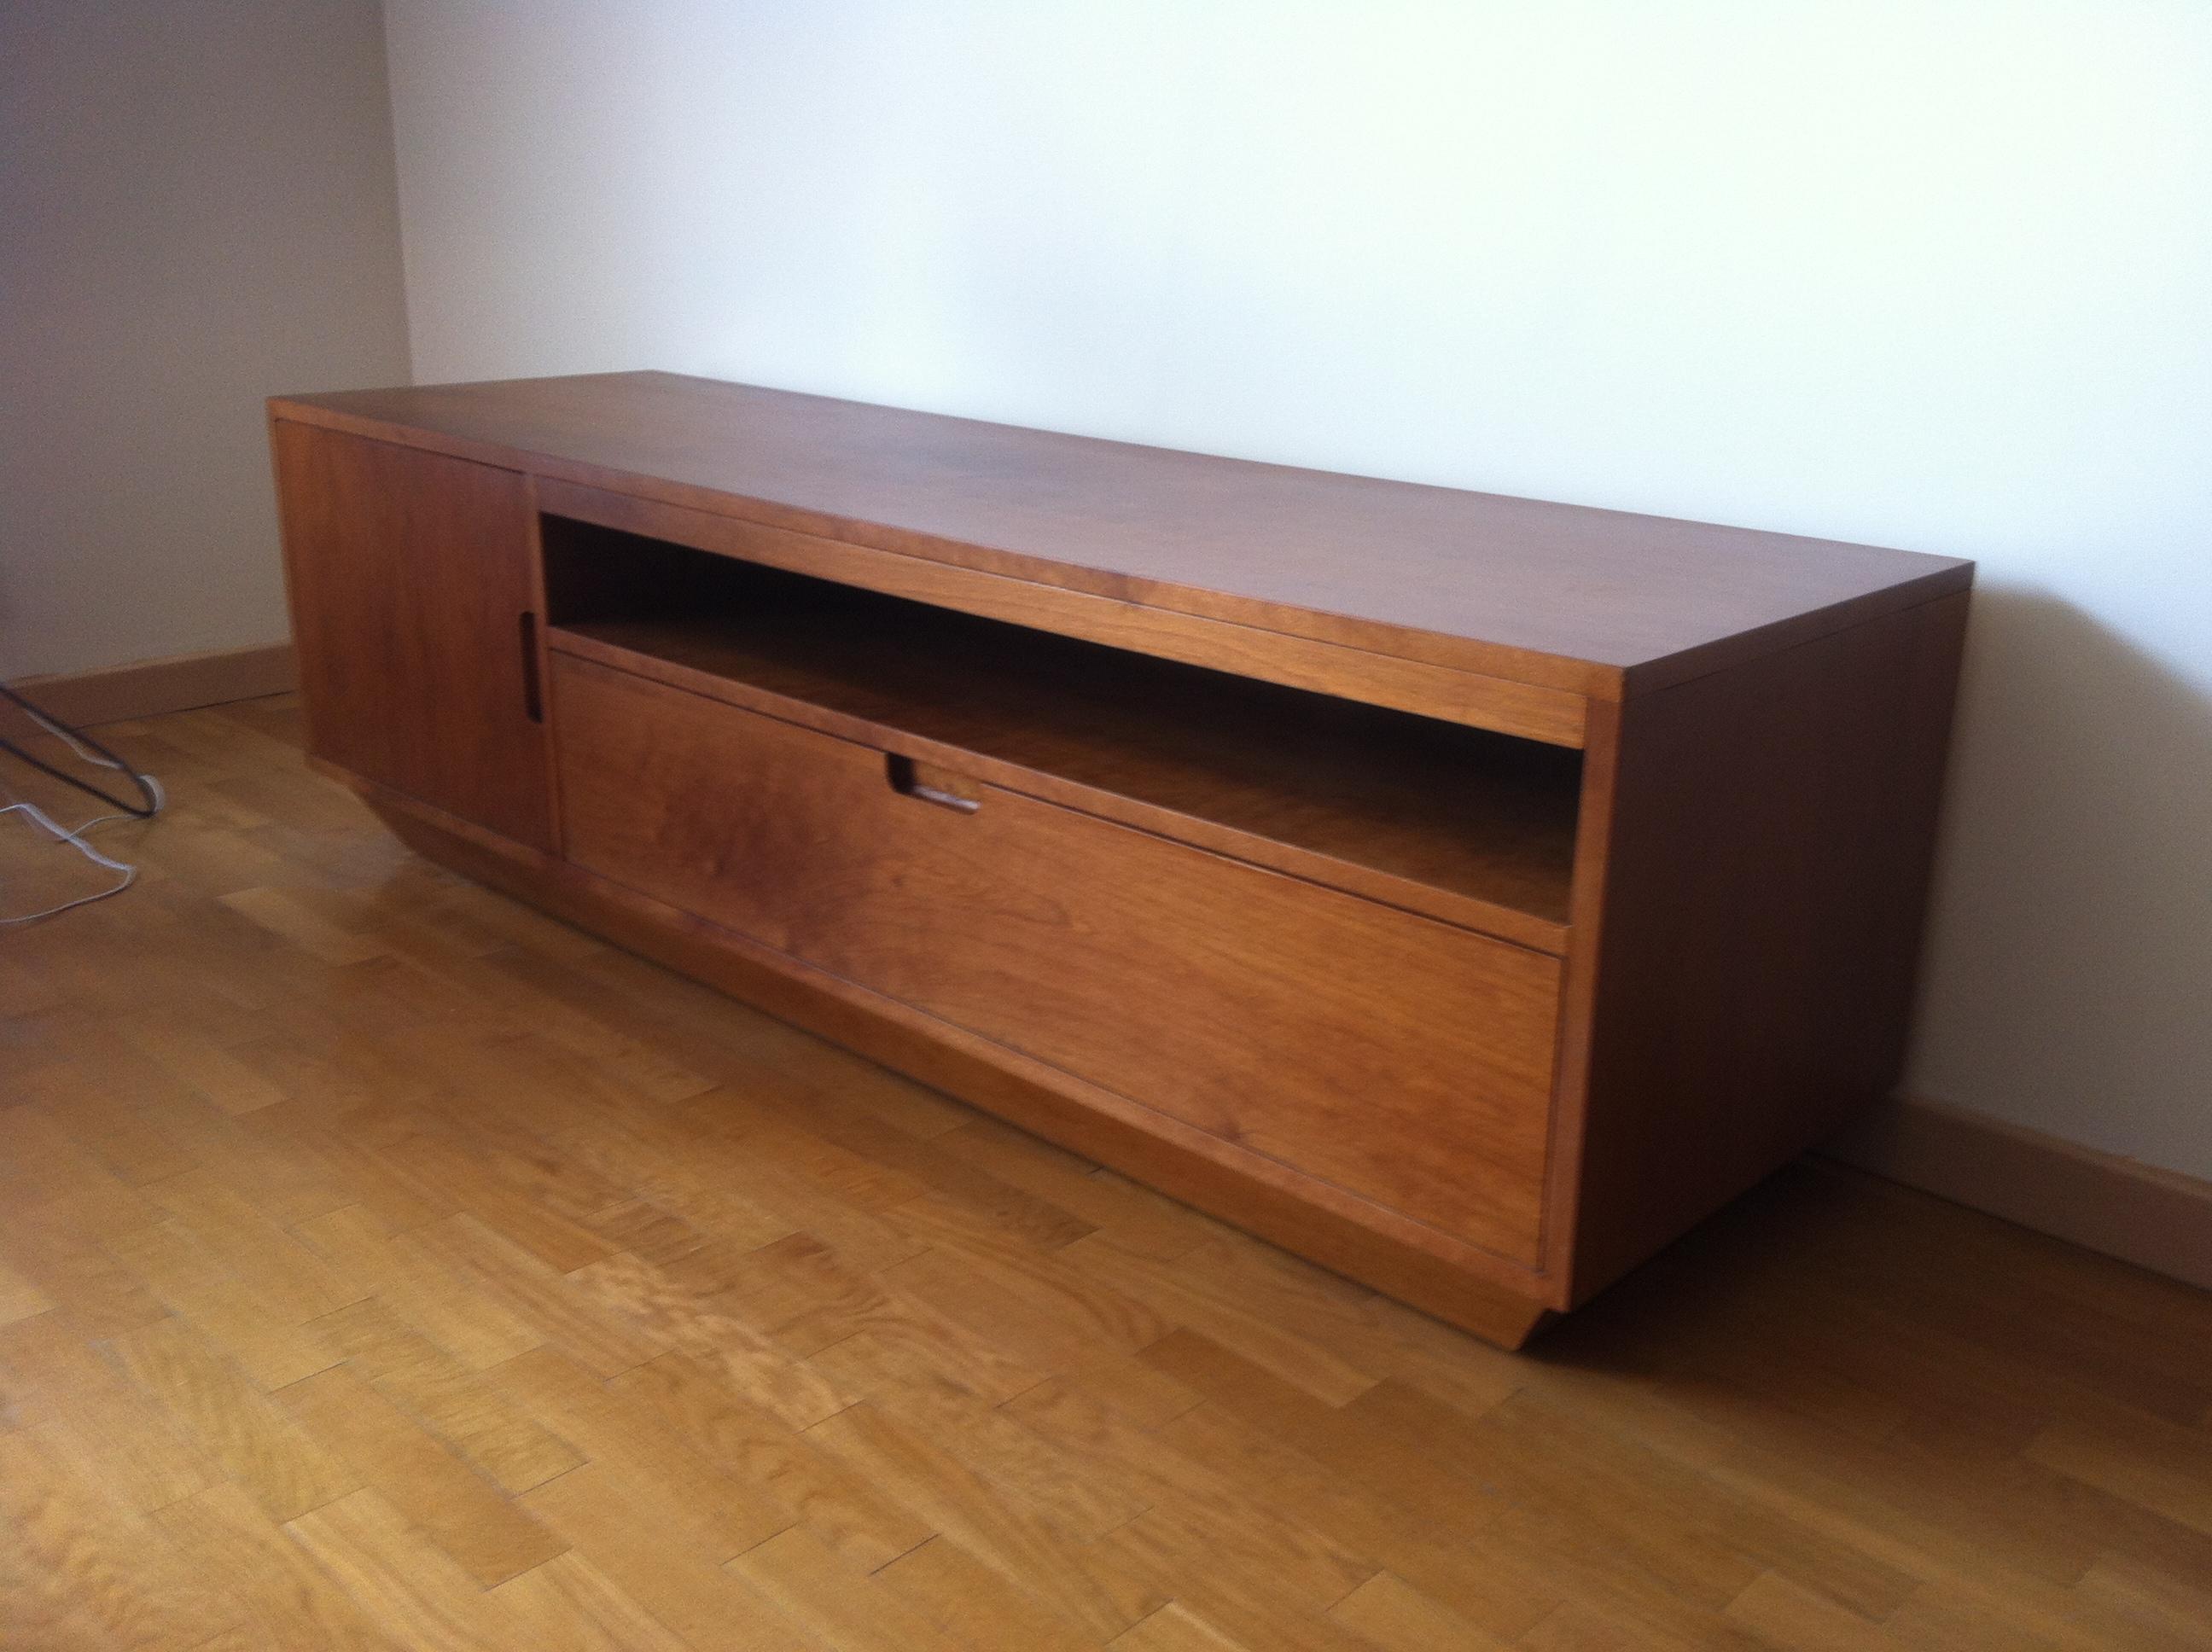 meuble hifi en merisier inspiration scandinave eb nisterie d 39 art alexandre philip. Black Bedroom Furniture Sets. Home Design Ideas